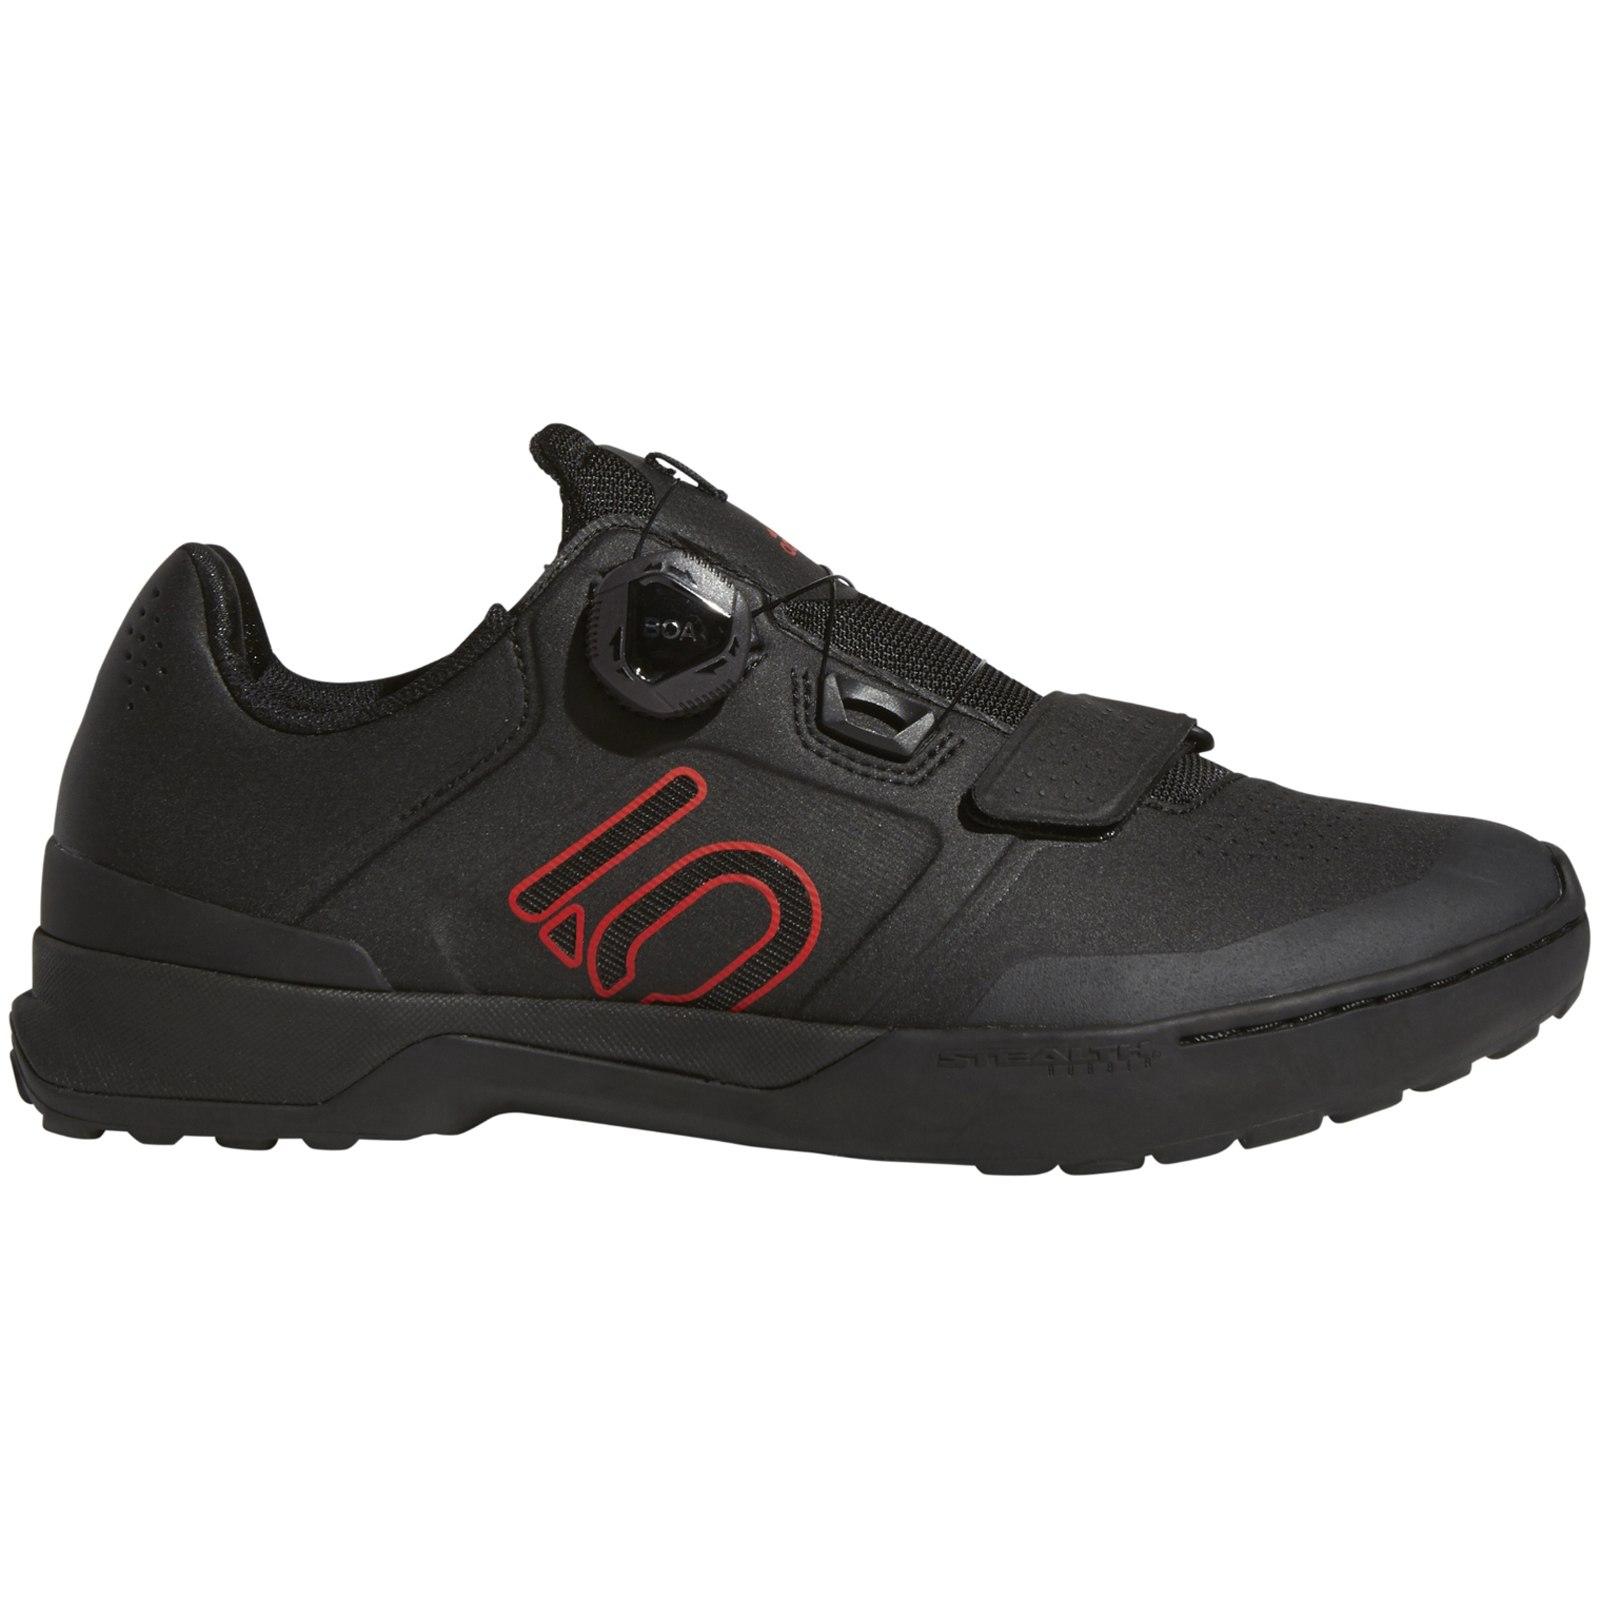 Foto de Five Ten Kestrel Pro Boa MTB Zapatillas de bicicleta - Core Black / Red